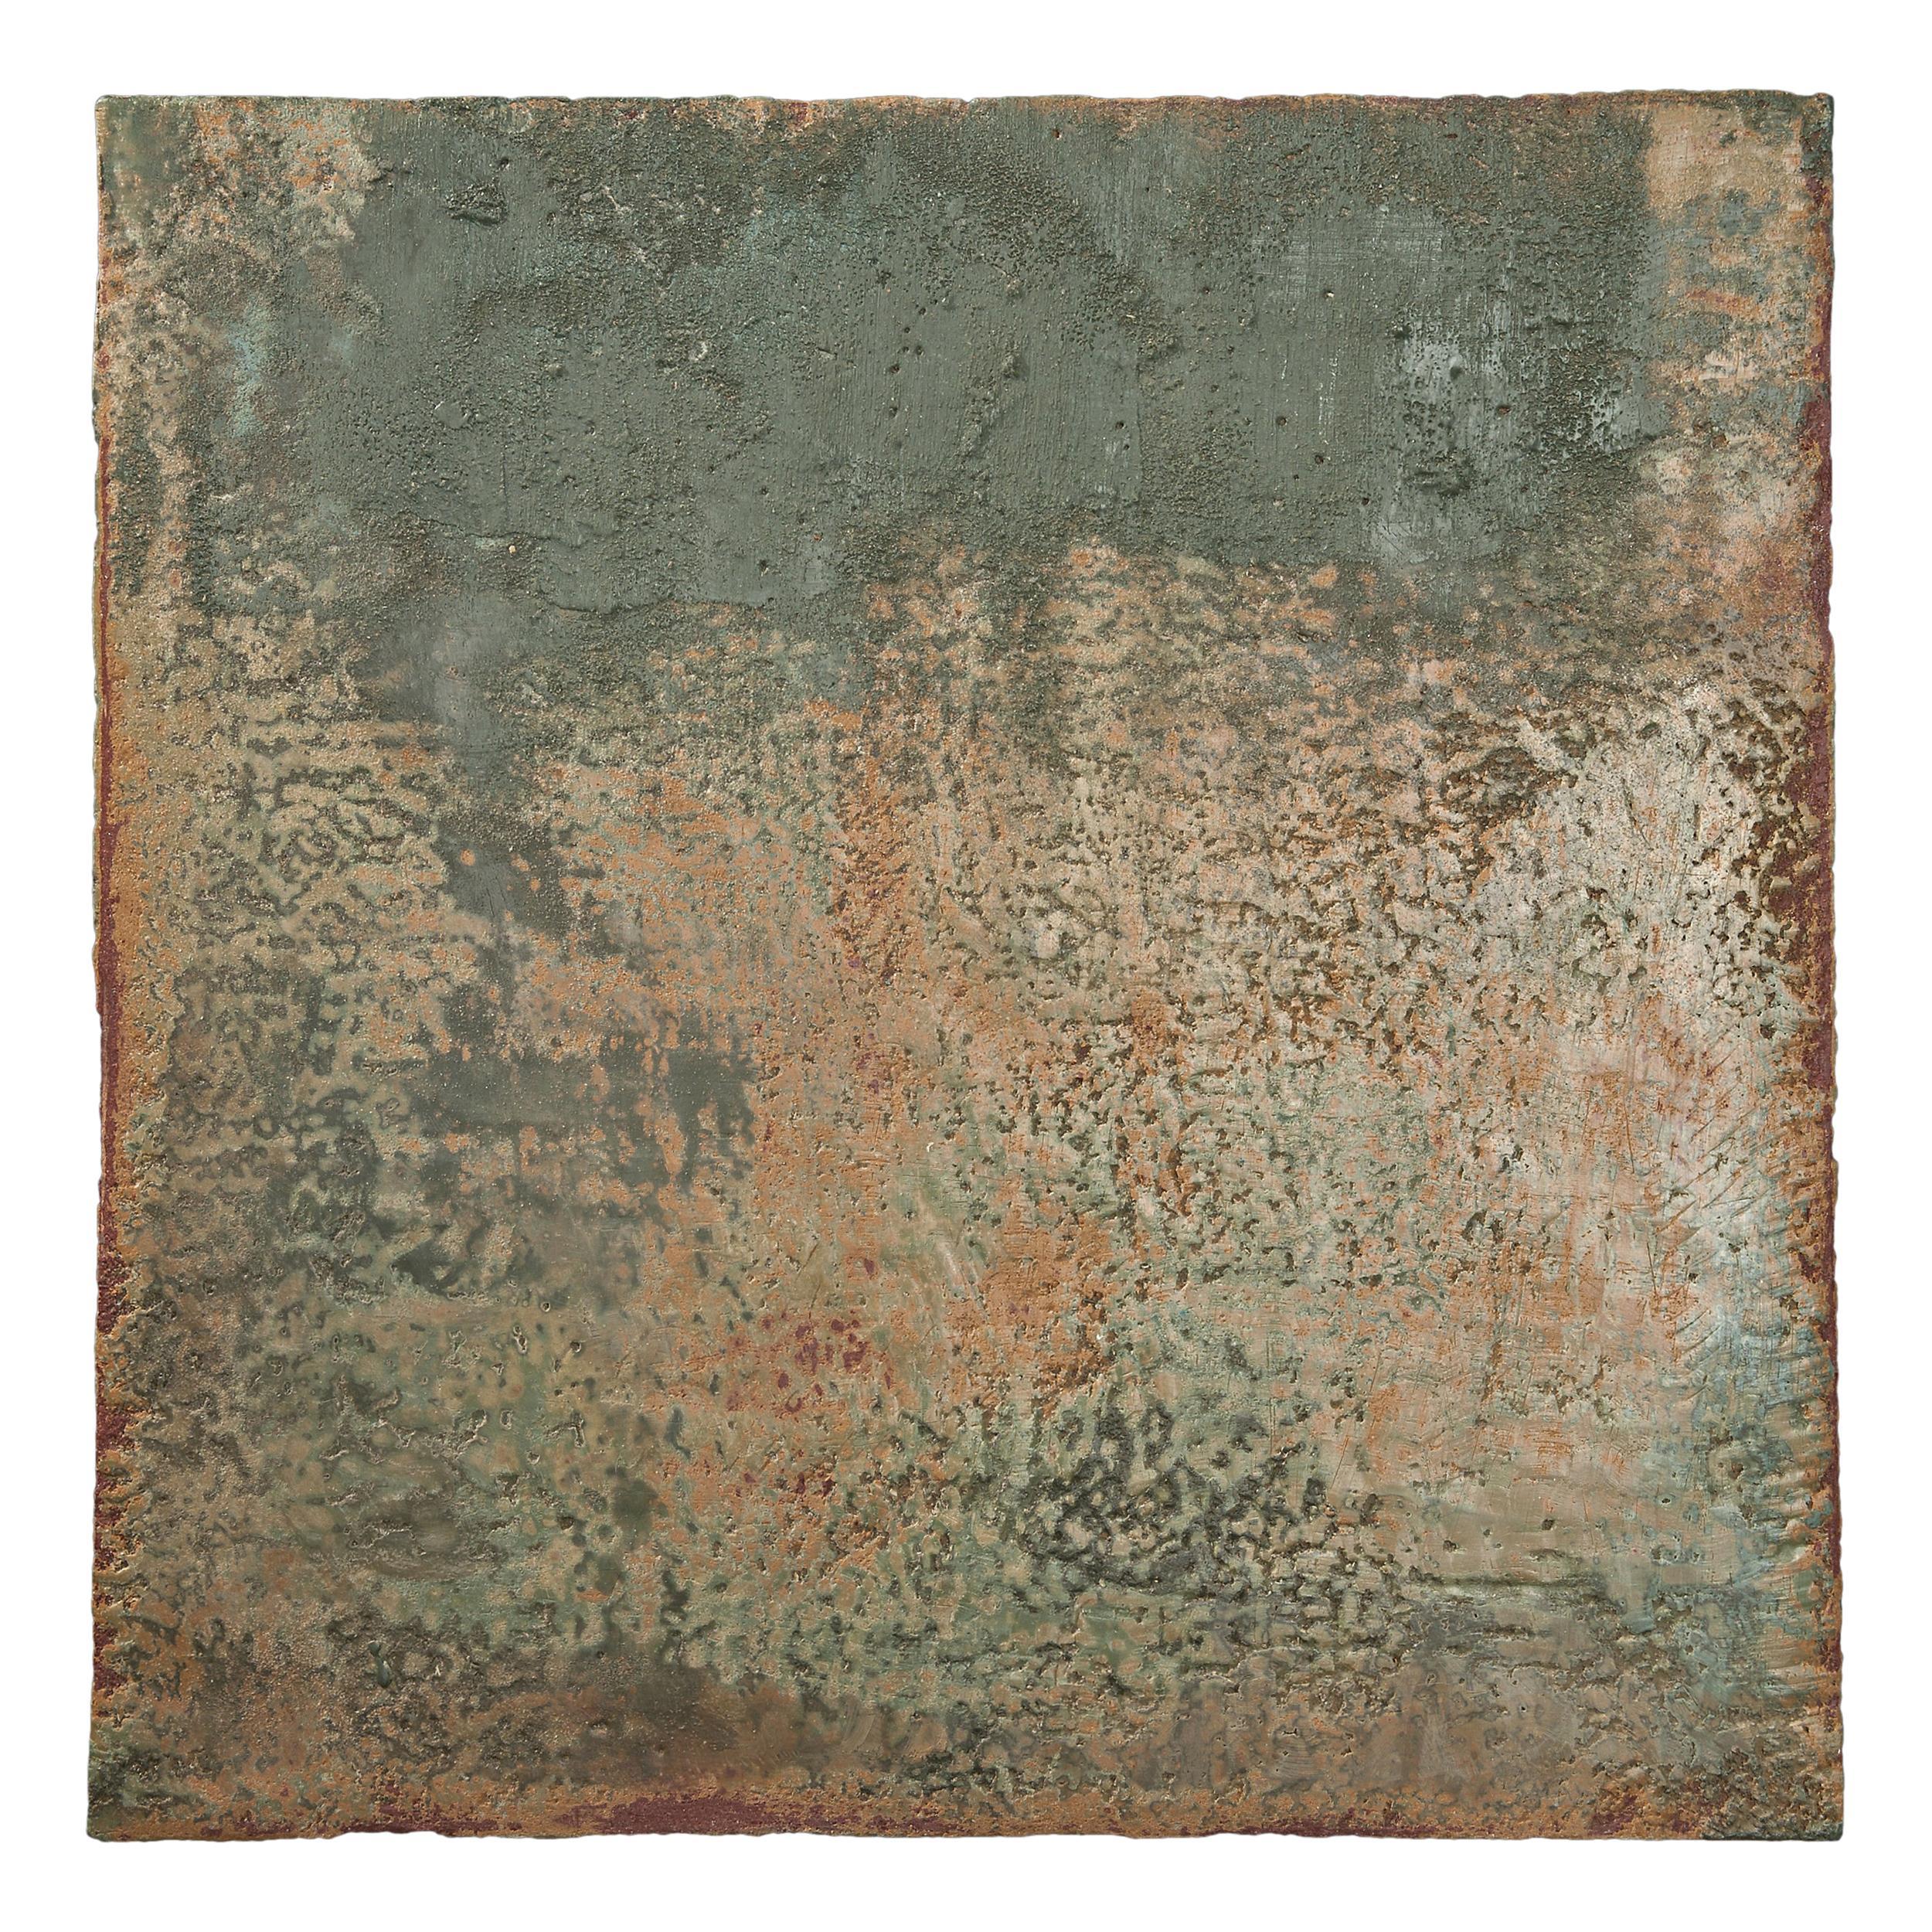 Richard Hirsch Encaustic Painting of Nothing #9, 2011